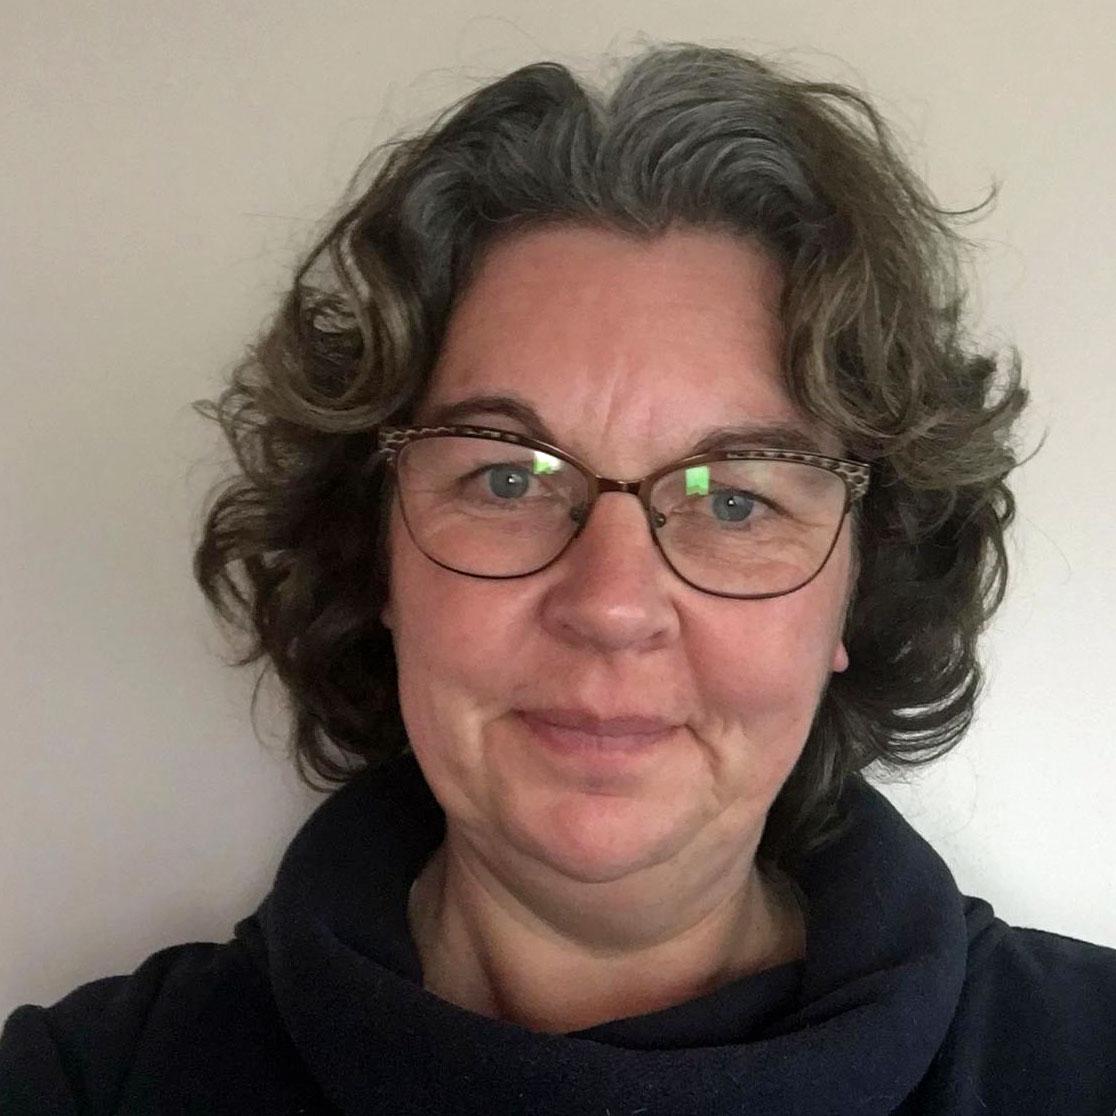 Natasja Brouwer is begeleider bij stichting ELF